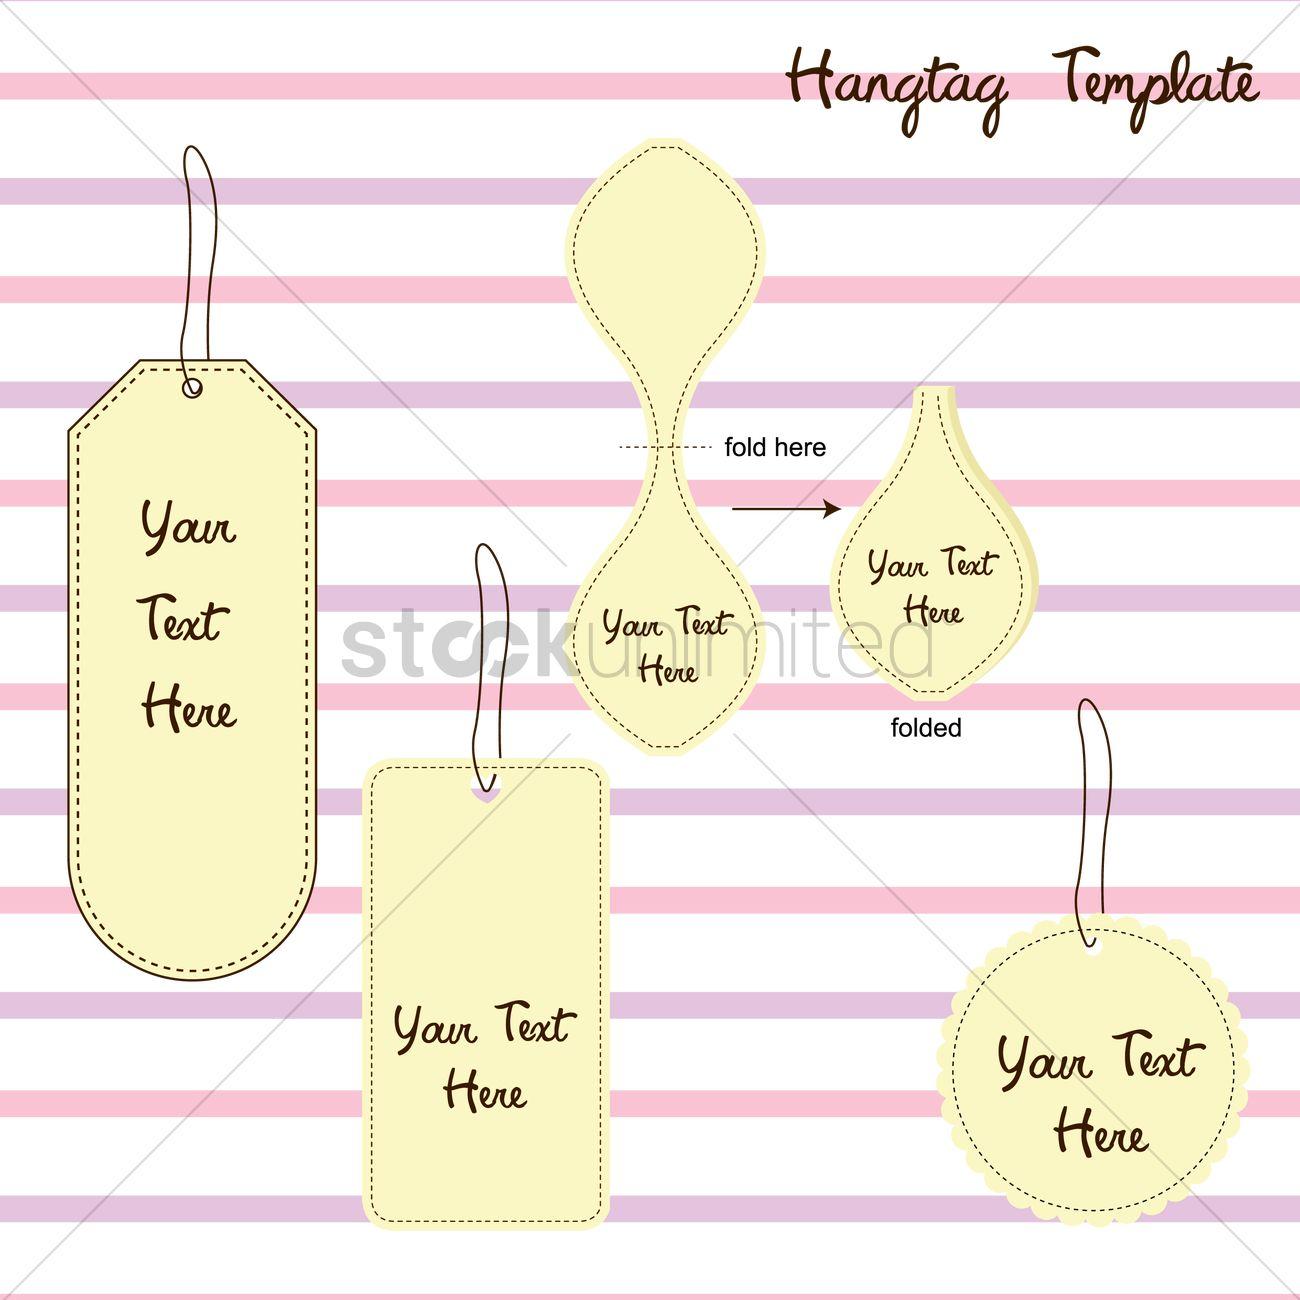 Hang tag template Vector Image - 1432027   StockUnlimited